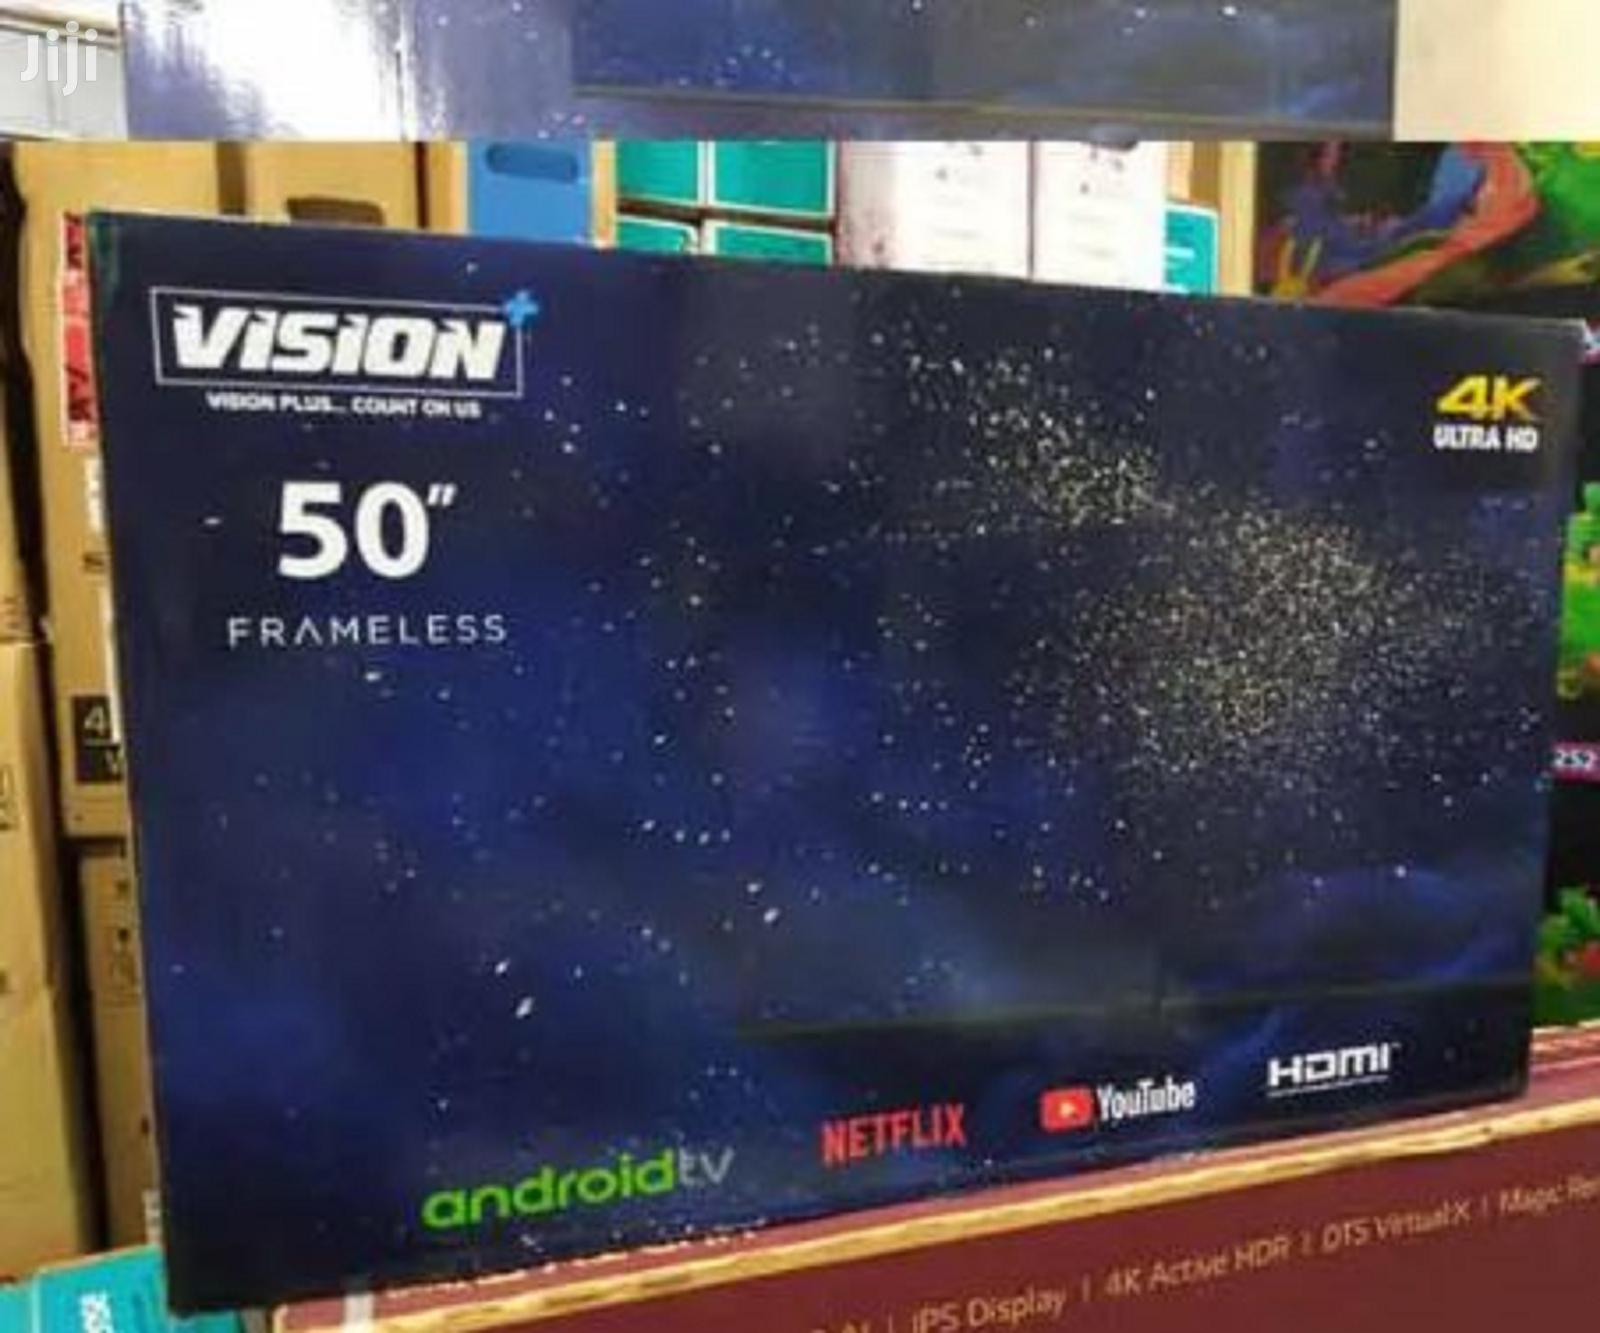 Vision Plus 50 Inch Frameless 4K UHD Smart Android Led TV